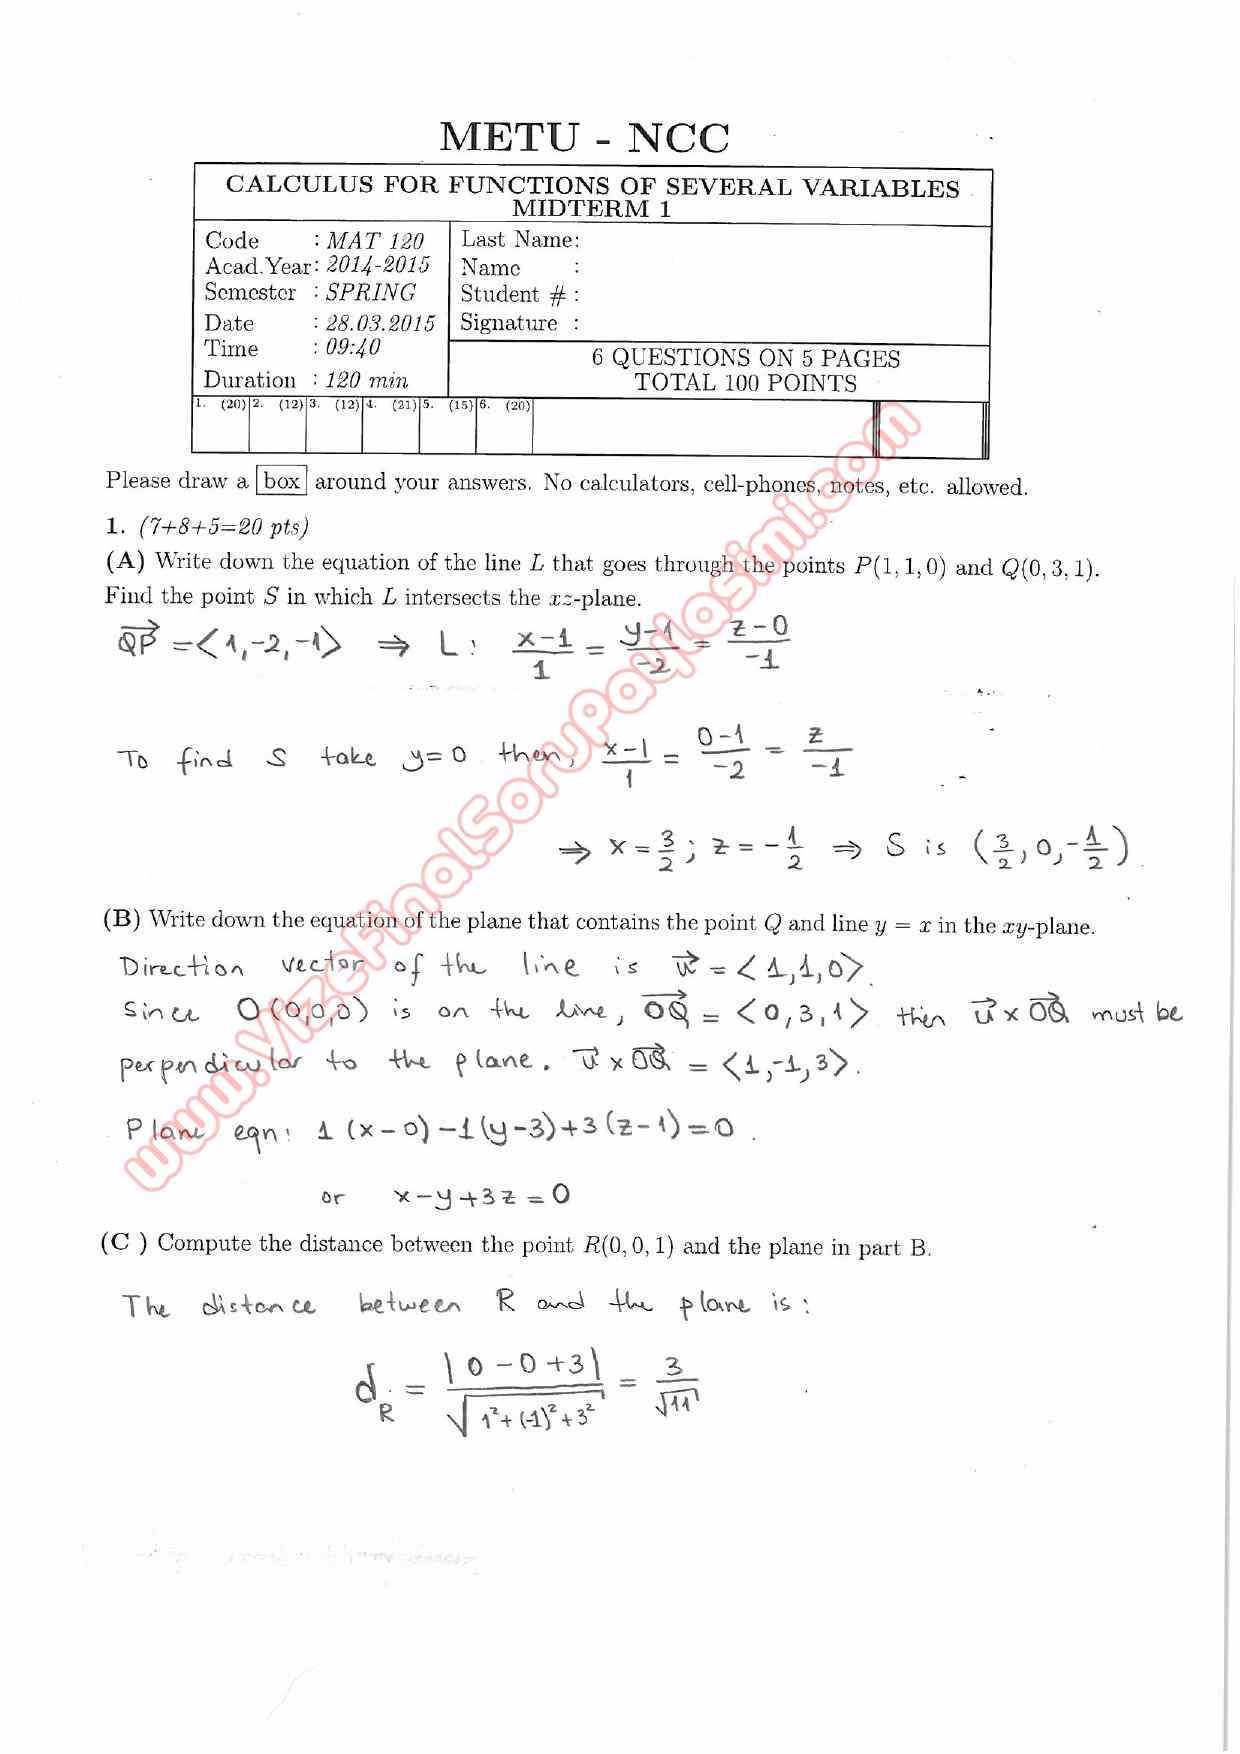 Midterm exam questions 2015 Homework Sample - September 2019